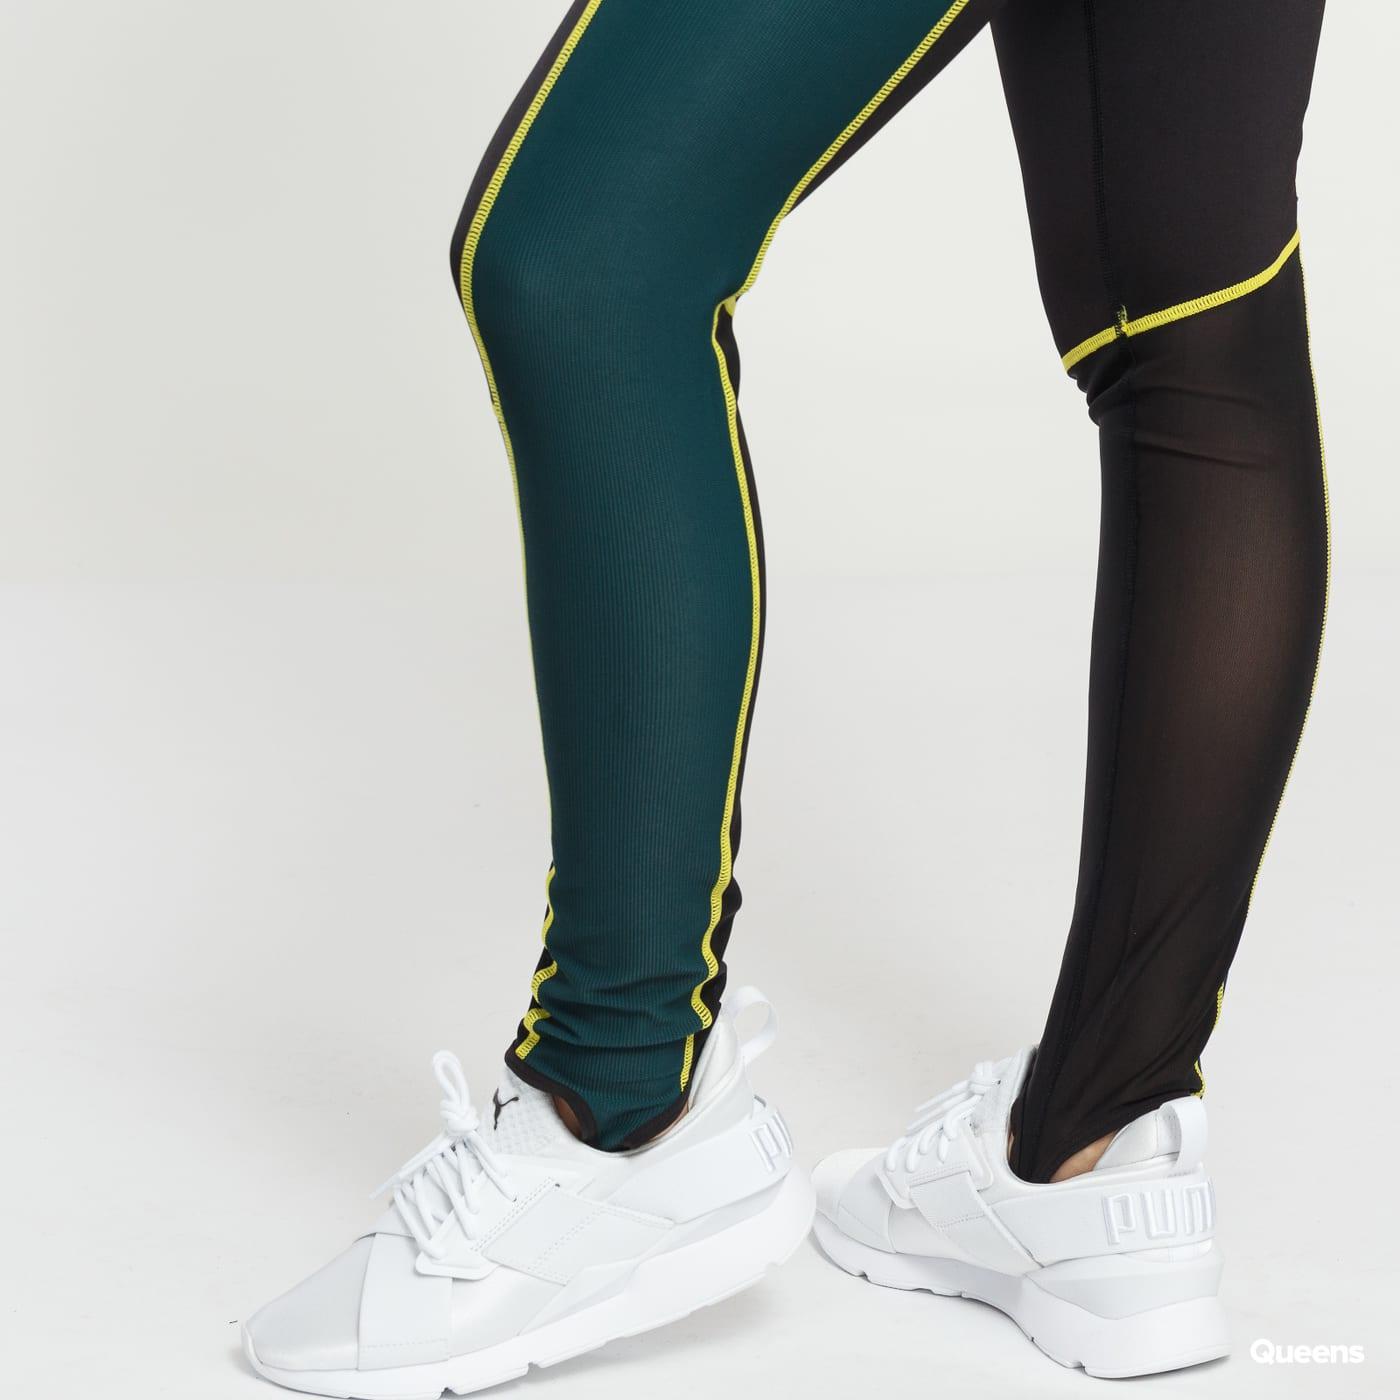 Puma TZ Highwaist Legging čierne / tmavozelené